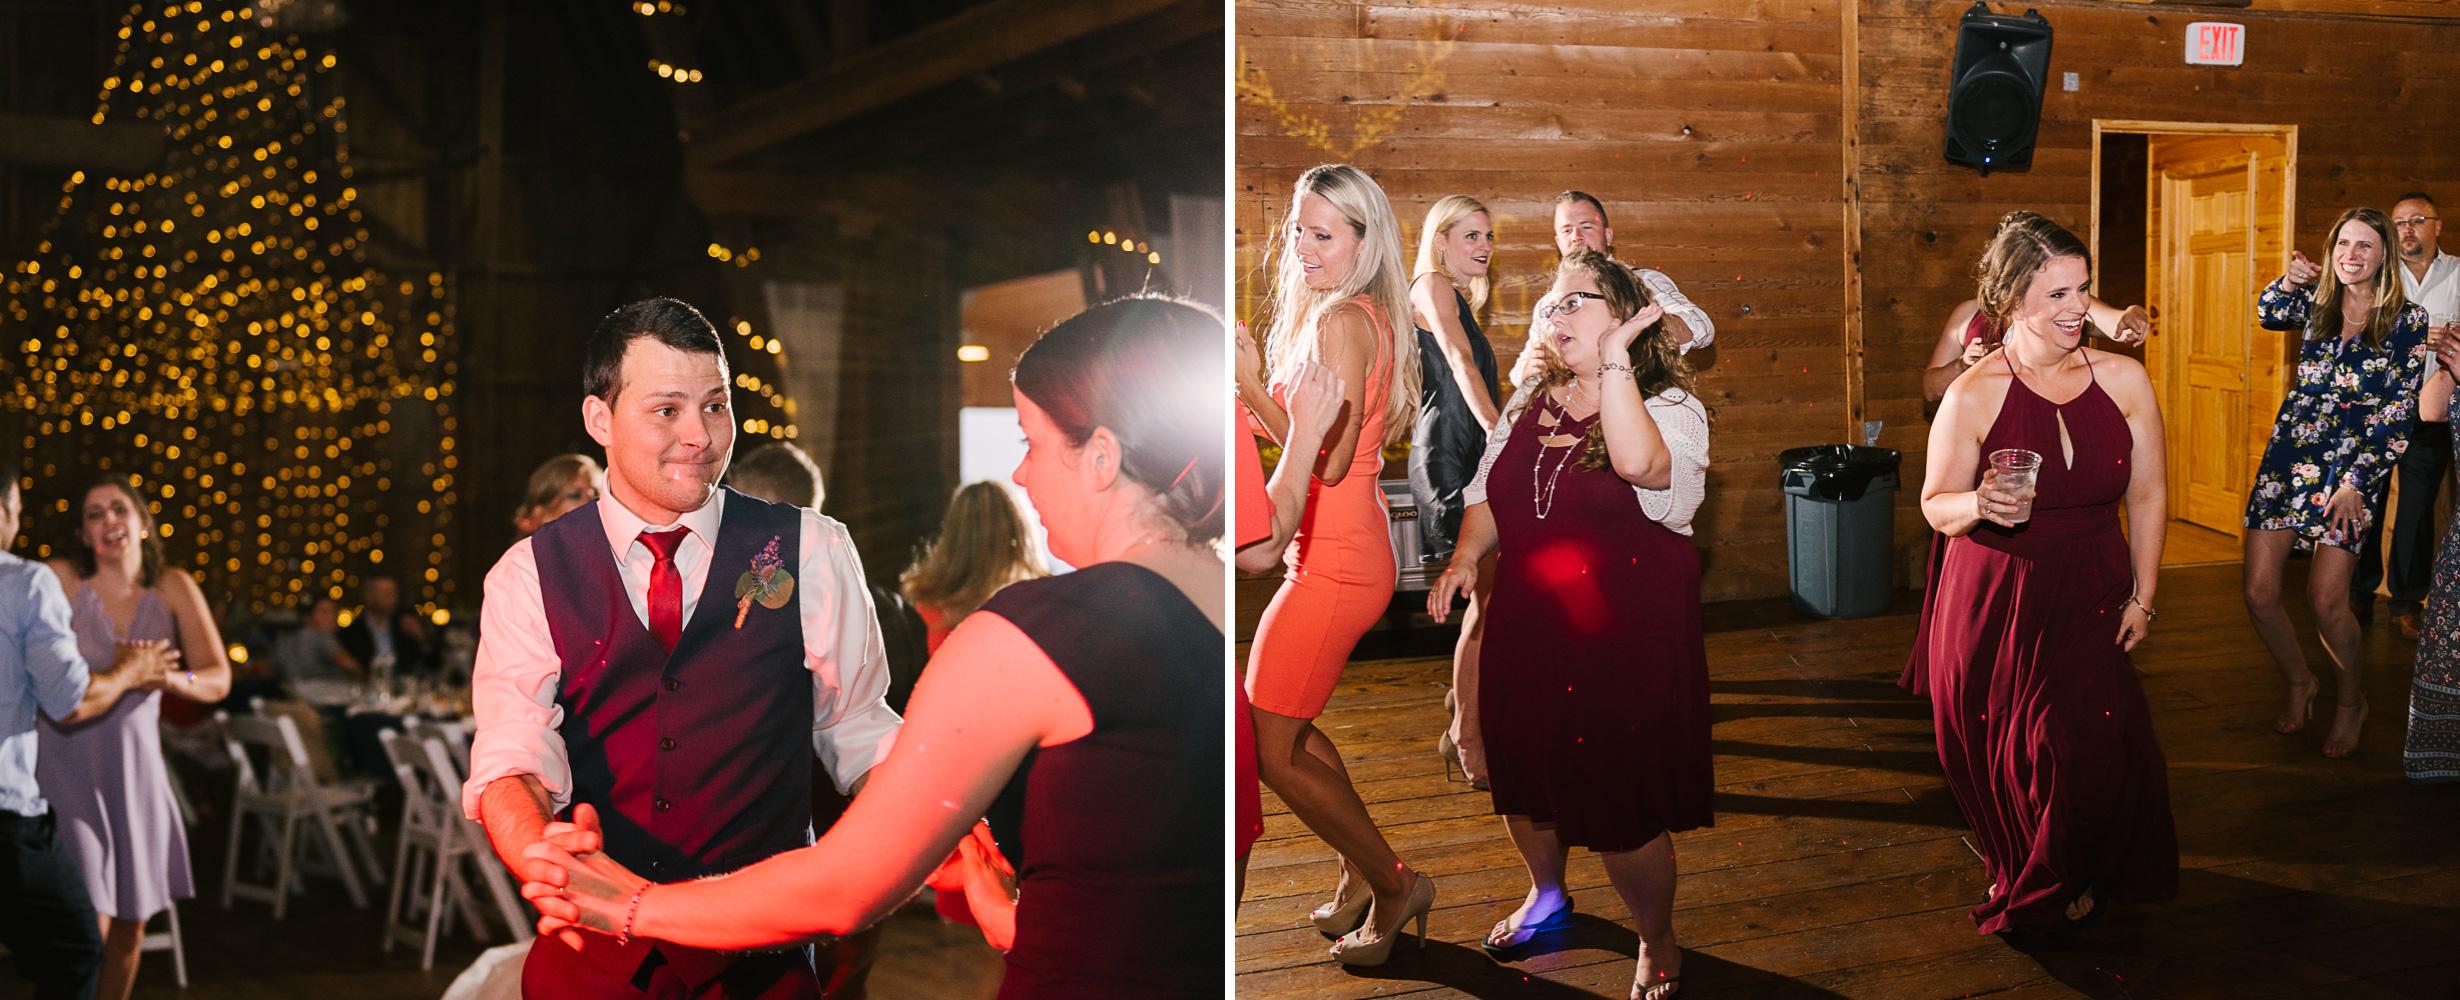 cobblestone-wedding-barn-rochester-photography-51.jpg